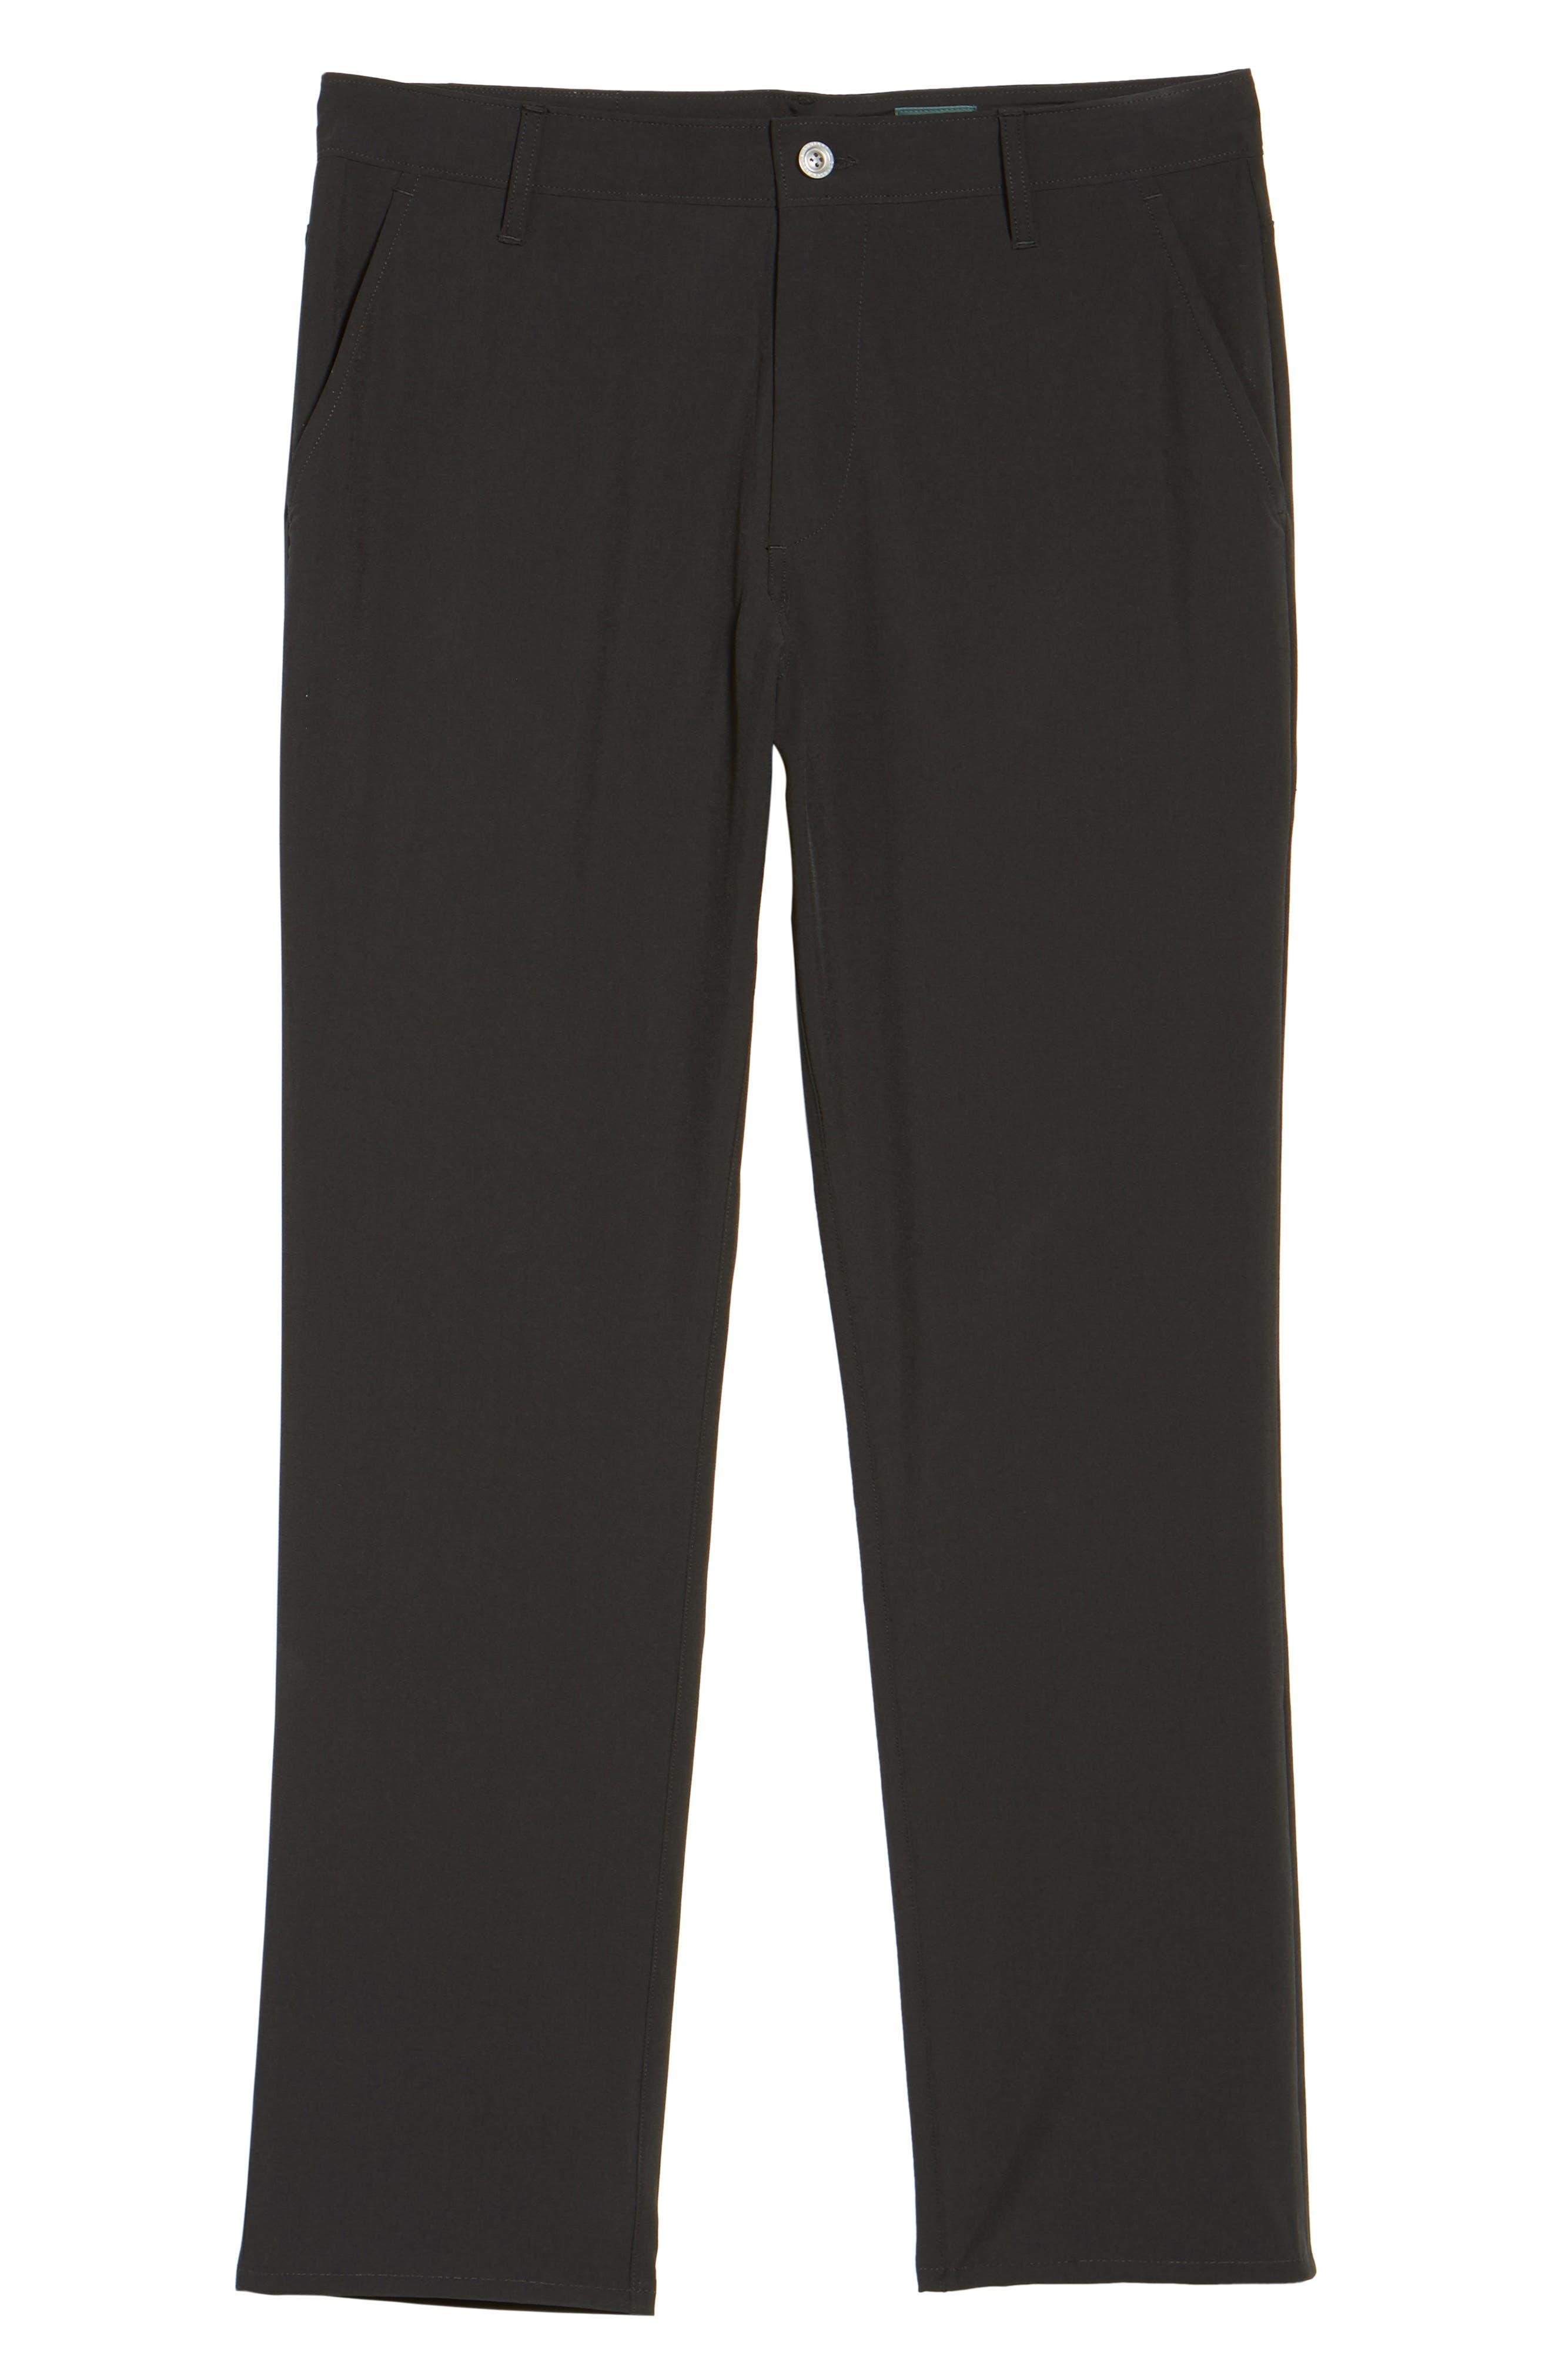 The Graduate Trousers,                             Alternate thumbnail 6, color,                             010